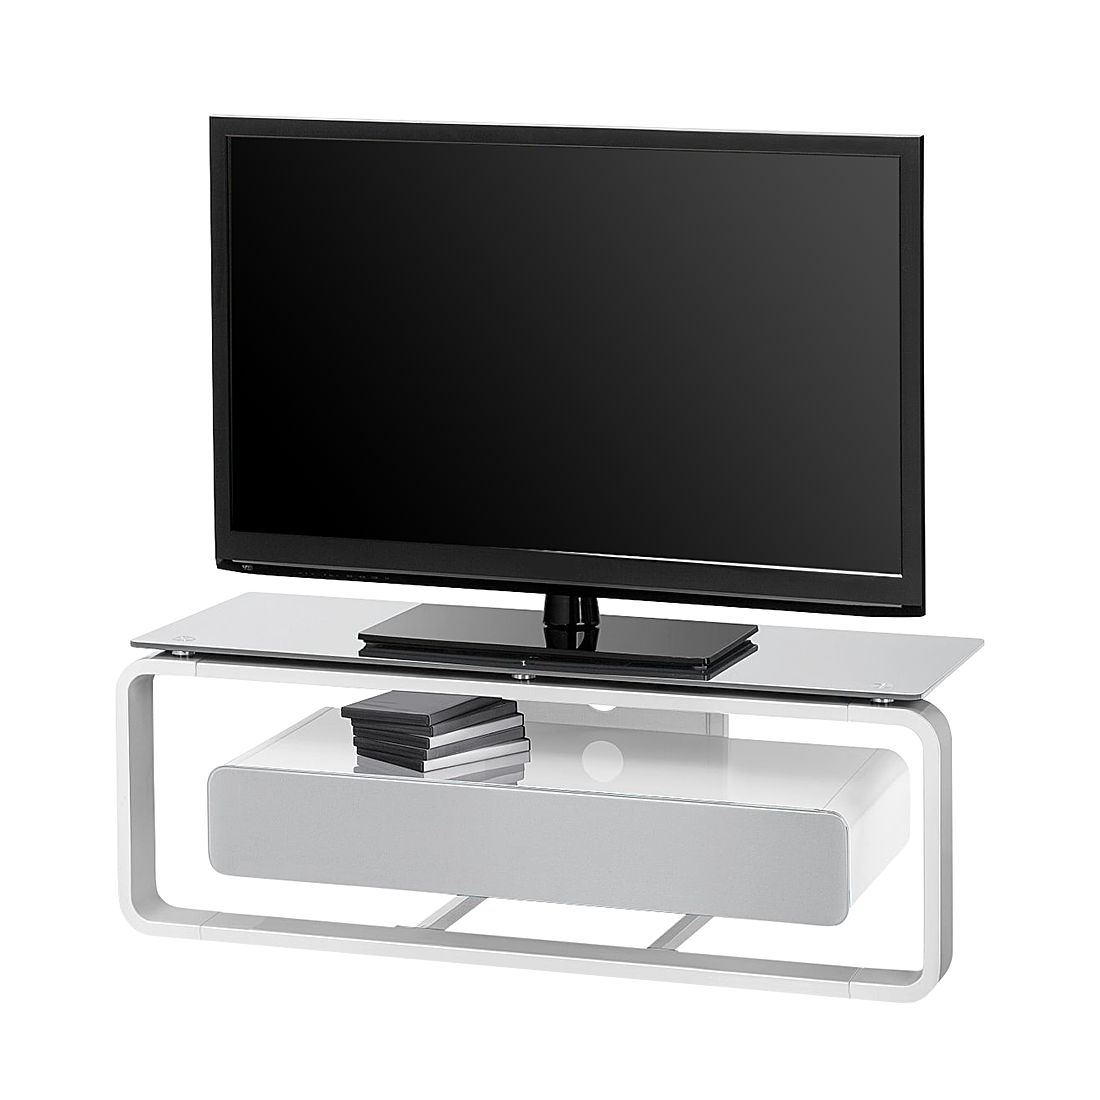 TV-Rack Shanon – Weiß / Glas Platingrau – 110 cm, loftscape bestellen